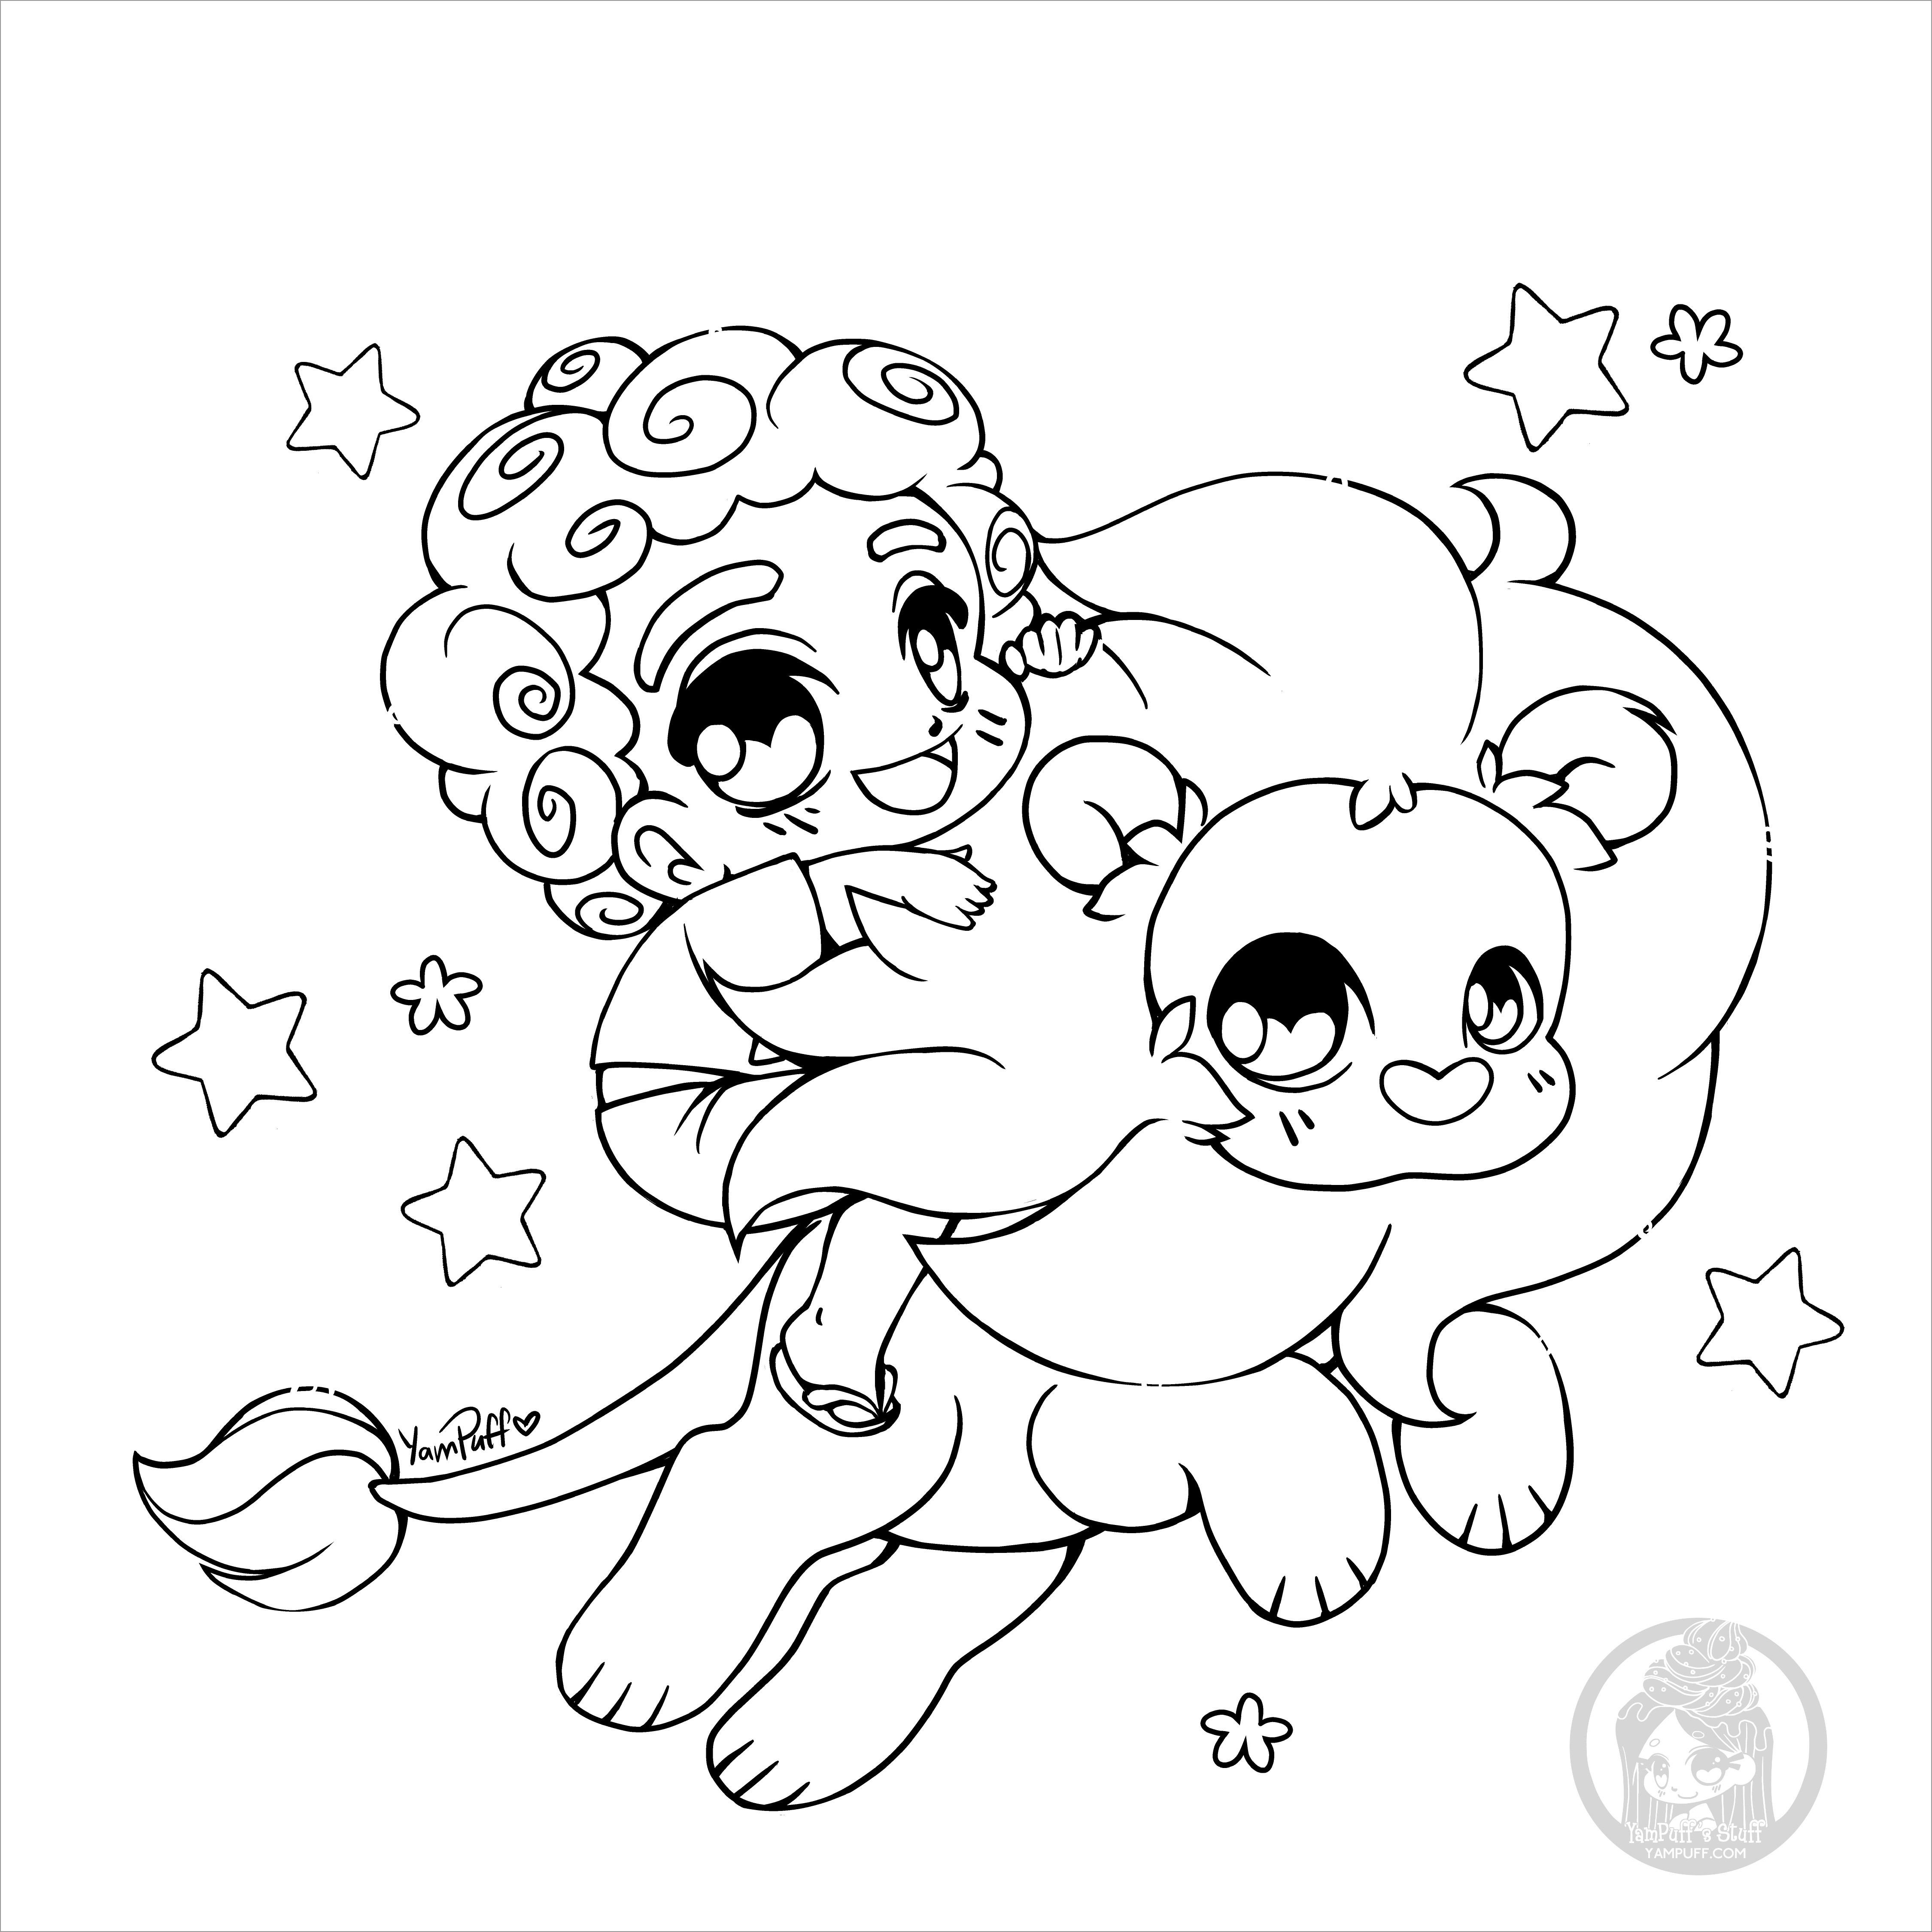 Fanart Chibi Coloring Page